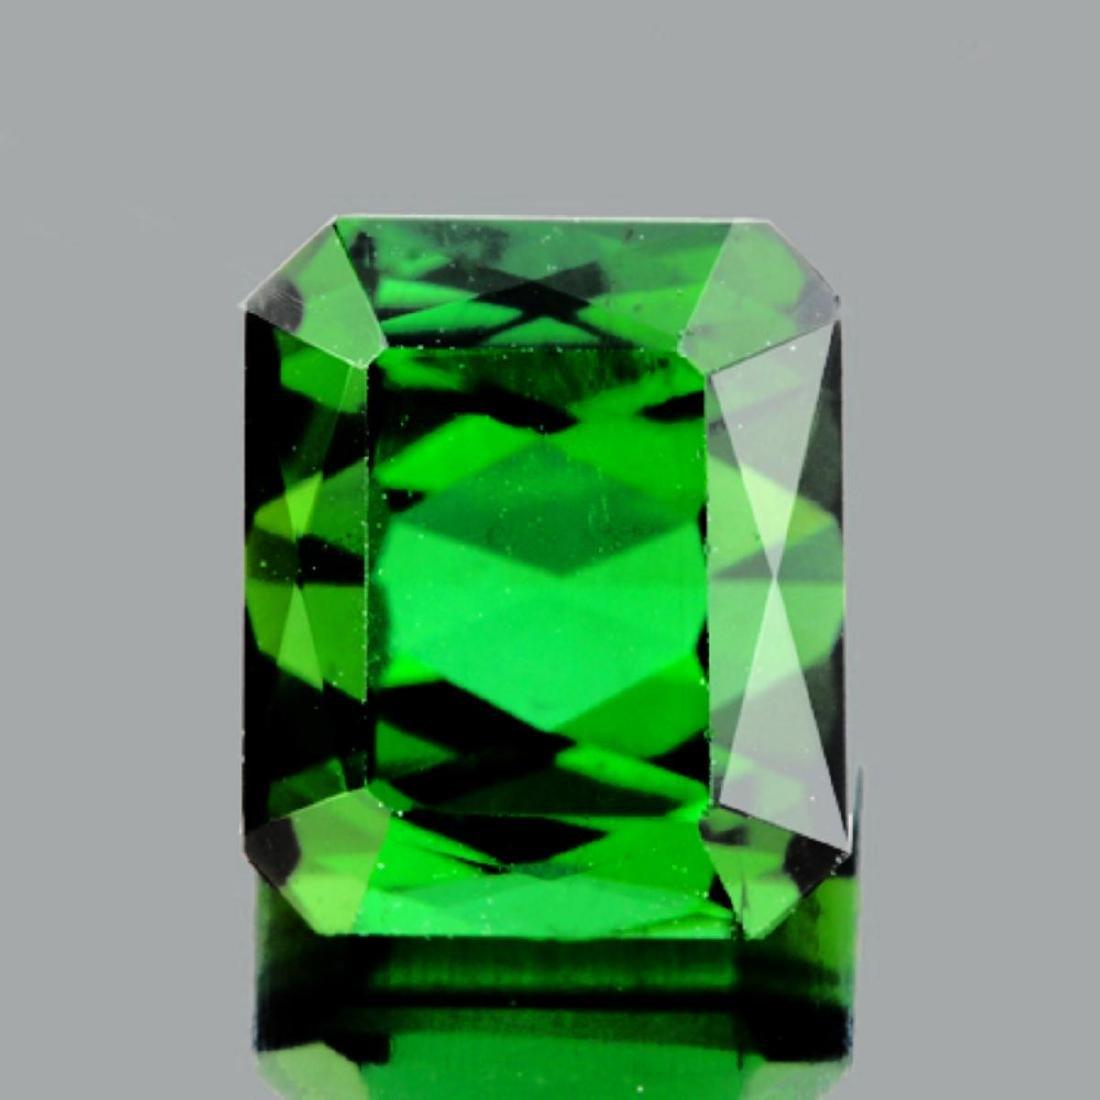 Natural Top Chrome Green Tourmaline 2.55 Cts - VVS